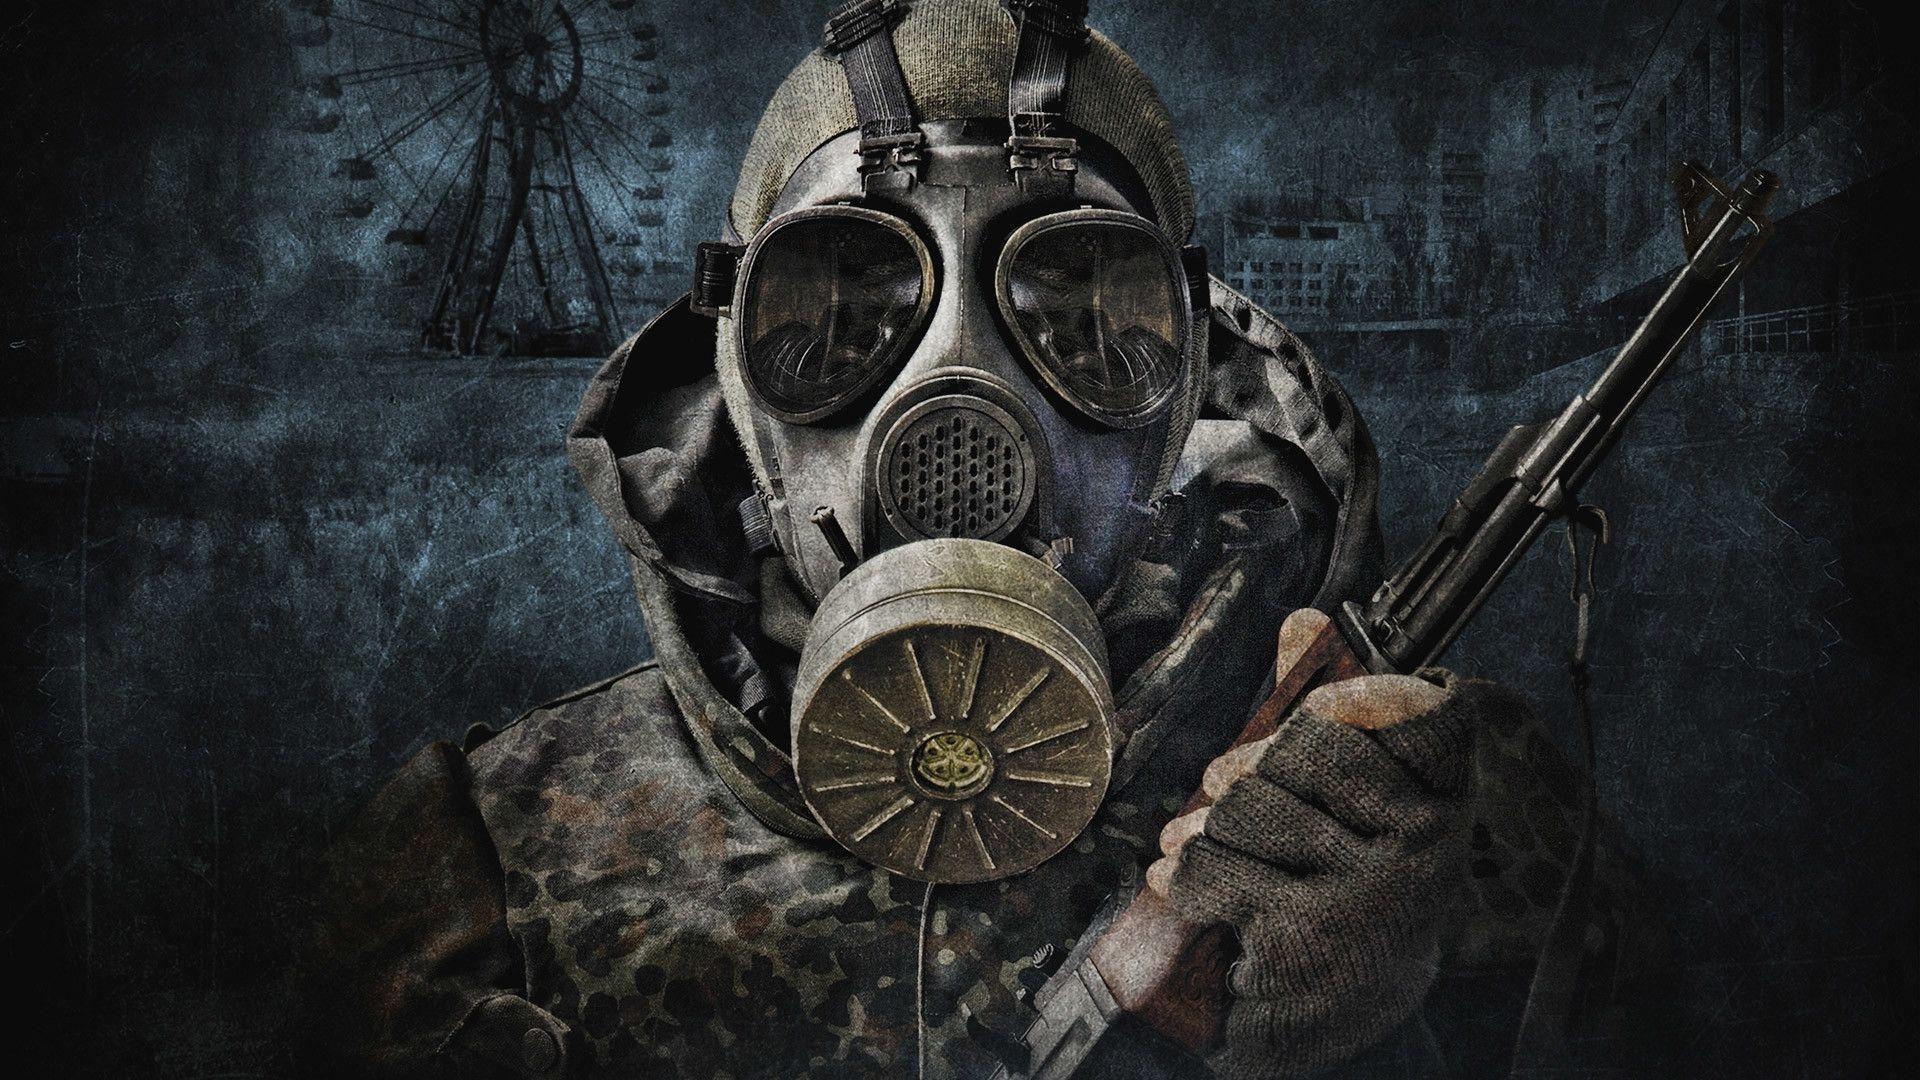 Stalker Shadow Of Chernobyl Wallpaper 1920x1080 Posted By Ryan Peltier